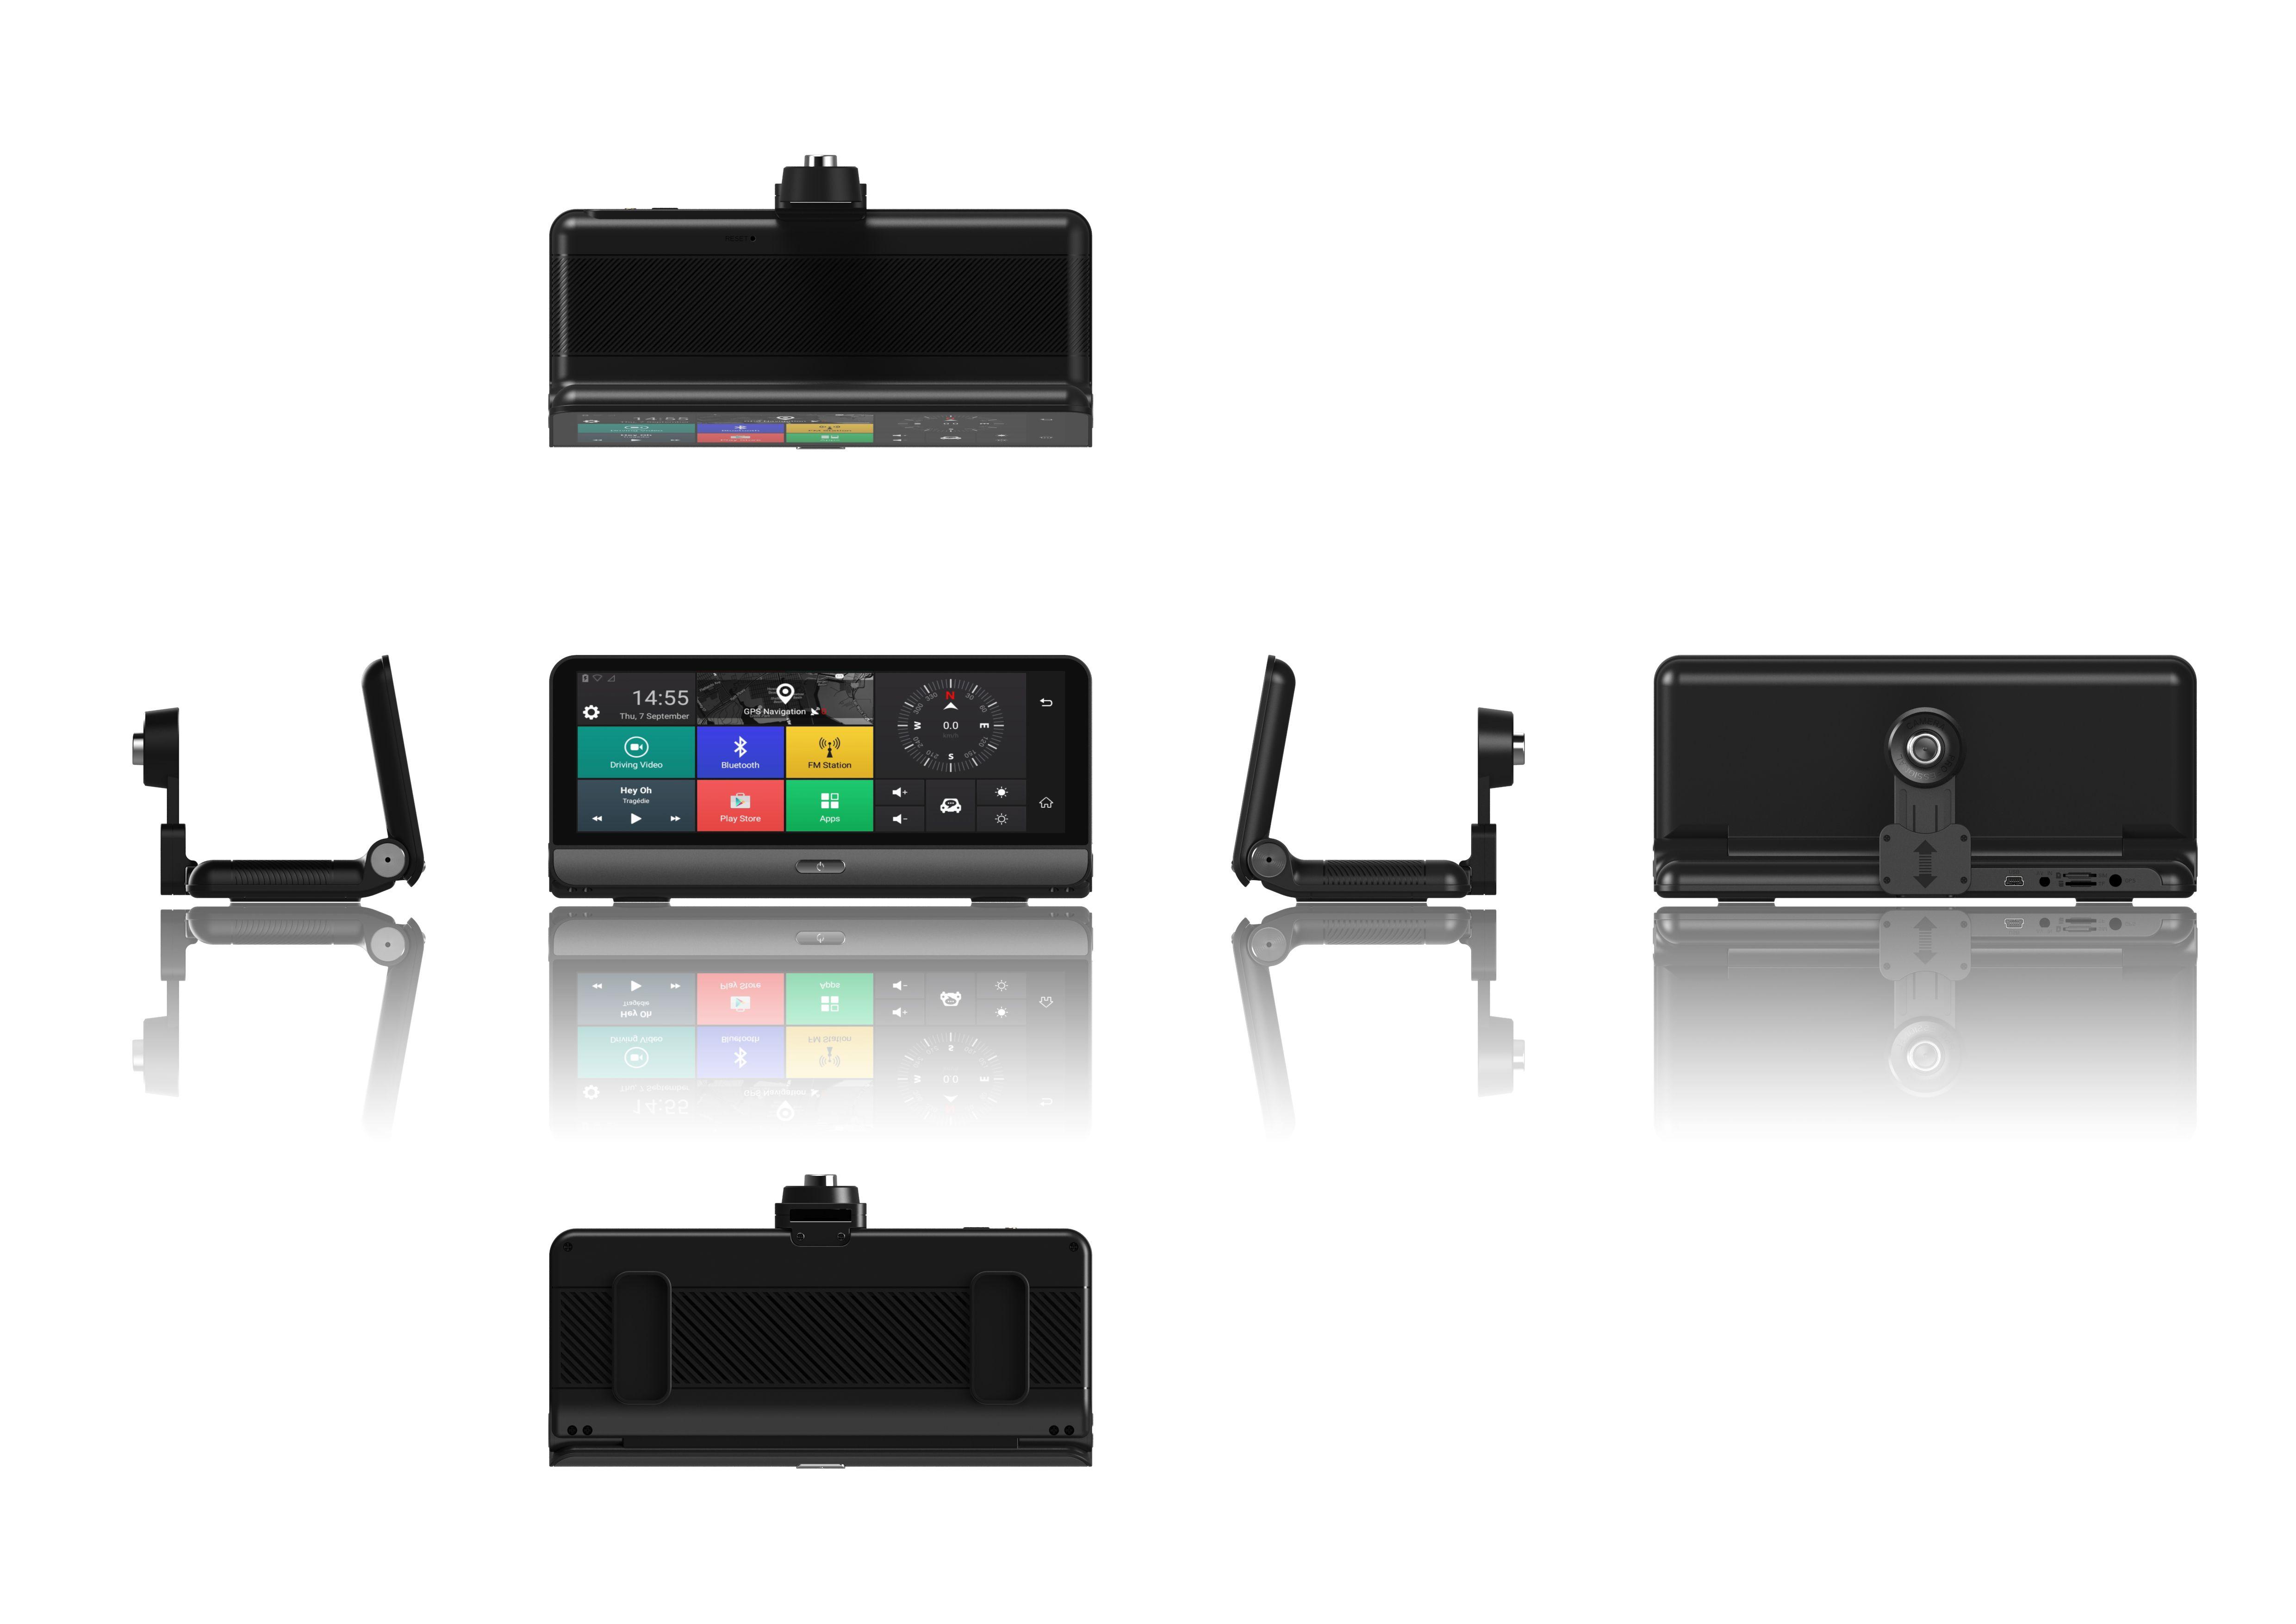 Navigator pentru bord Star E09 DVR 4G, Android 5.0, GPS, 8 inch, 1GB RAM 16GB ROM, Wifi, Bluetooth, Camera fata spate7